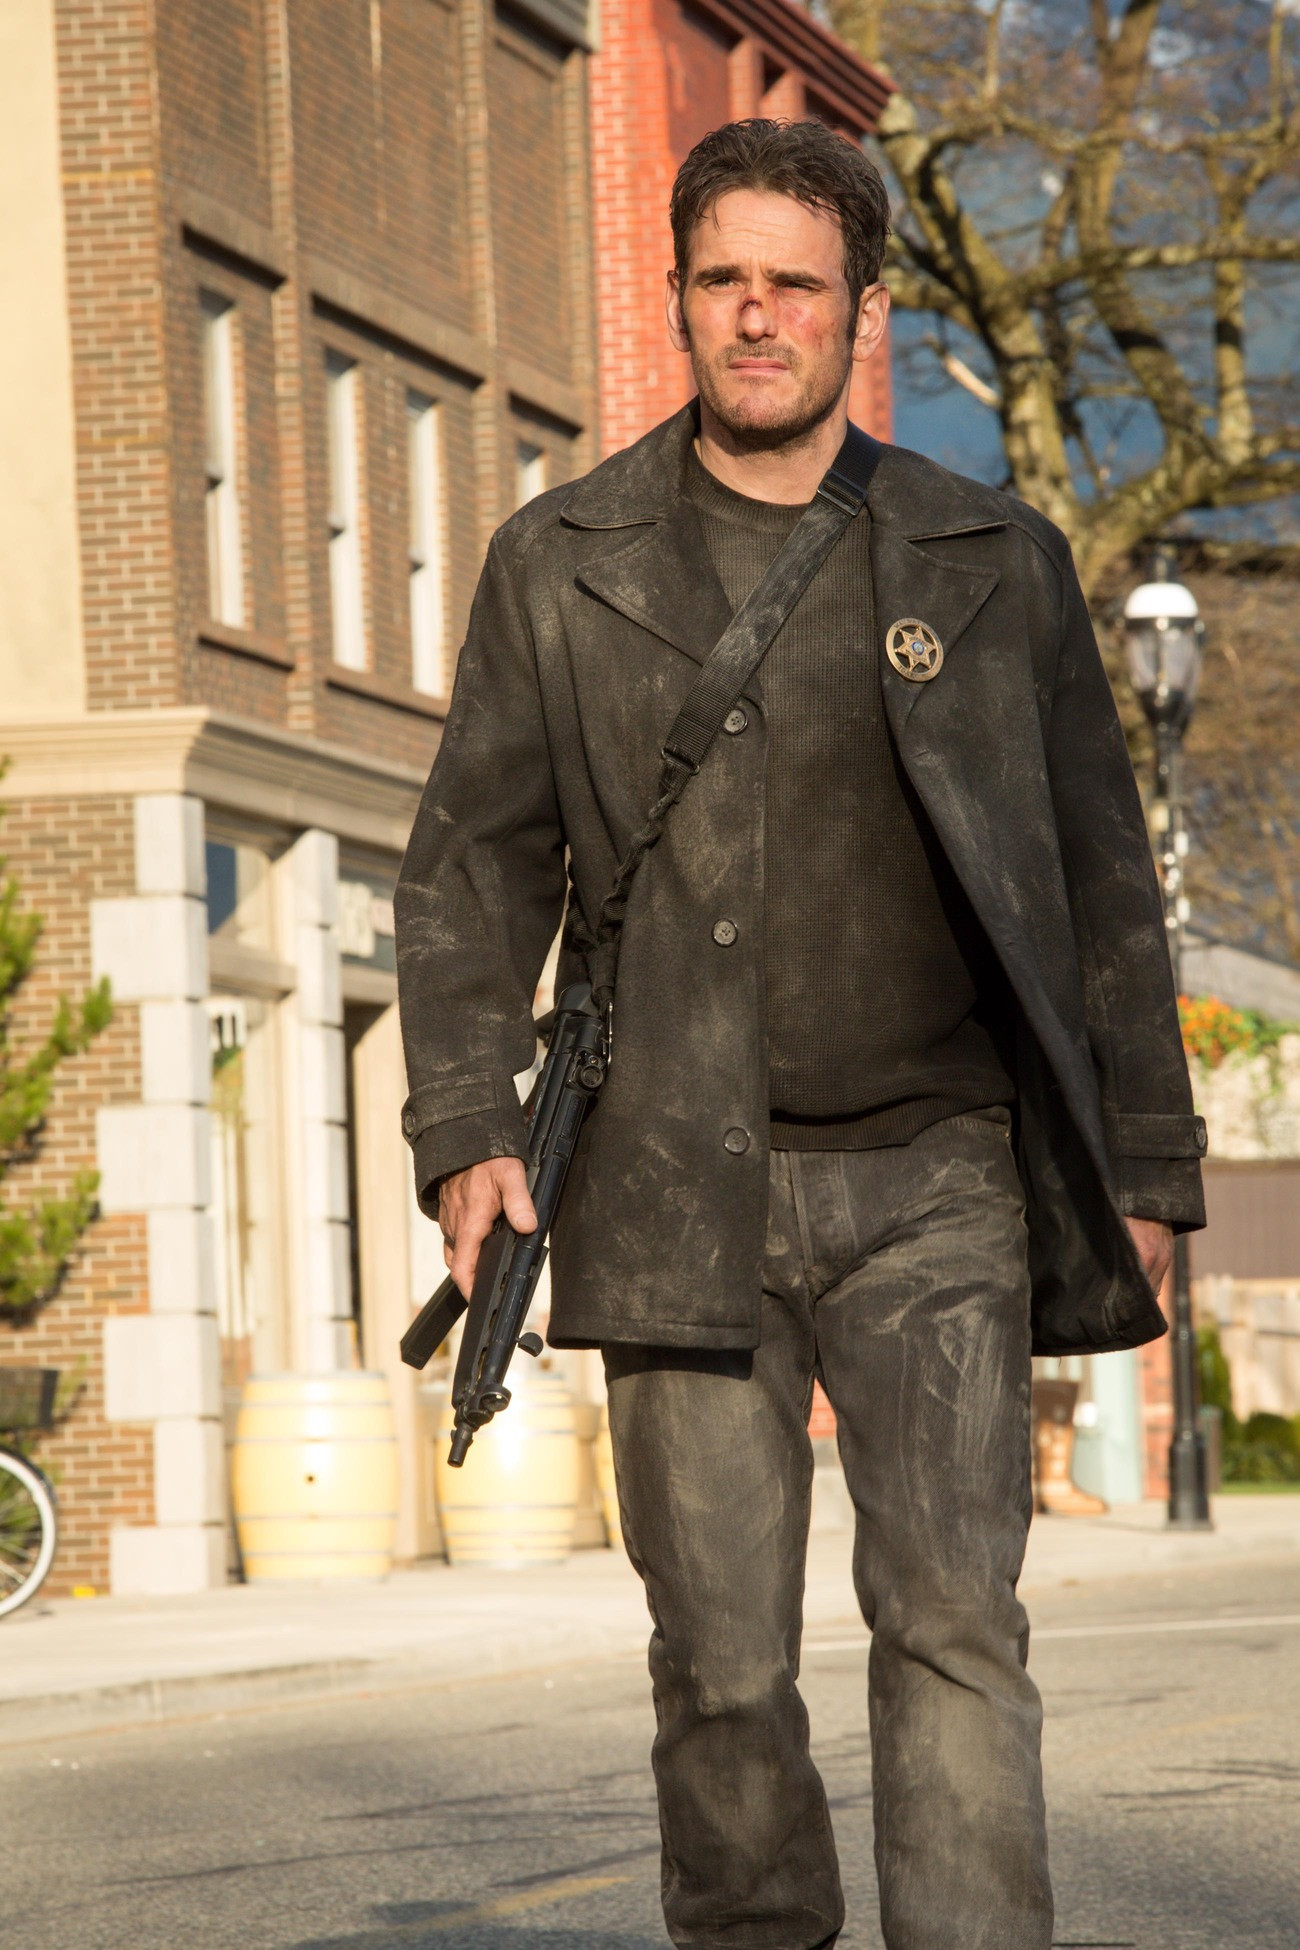 "WAYWARD PINES: Ethan (Matt Dillon) patrols Main Street in the ""Cycle"" season finale episode of WAYWARD PINES airing Thursday, July 23 (9:00-10:00 PM ET/PT) on FOX. ©2015 Fox Broadcasting Co. Cr: Liane Hentscher/FOX"